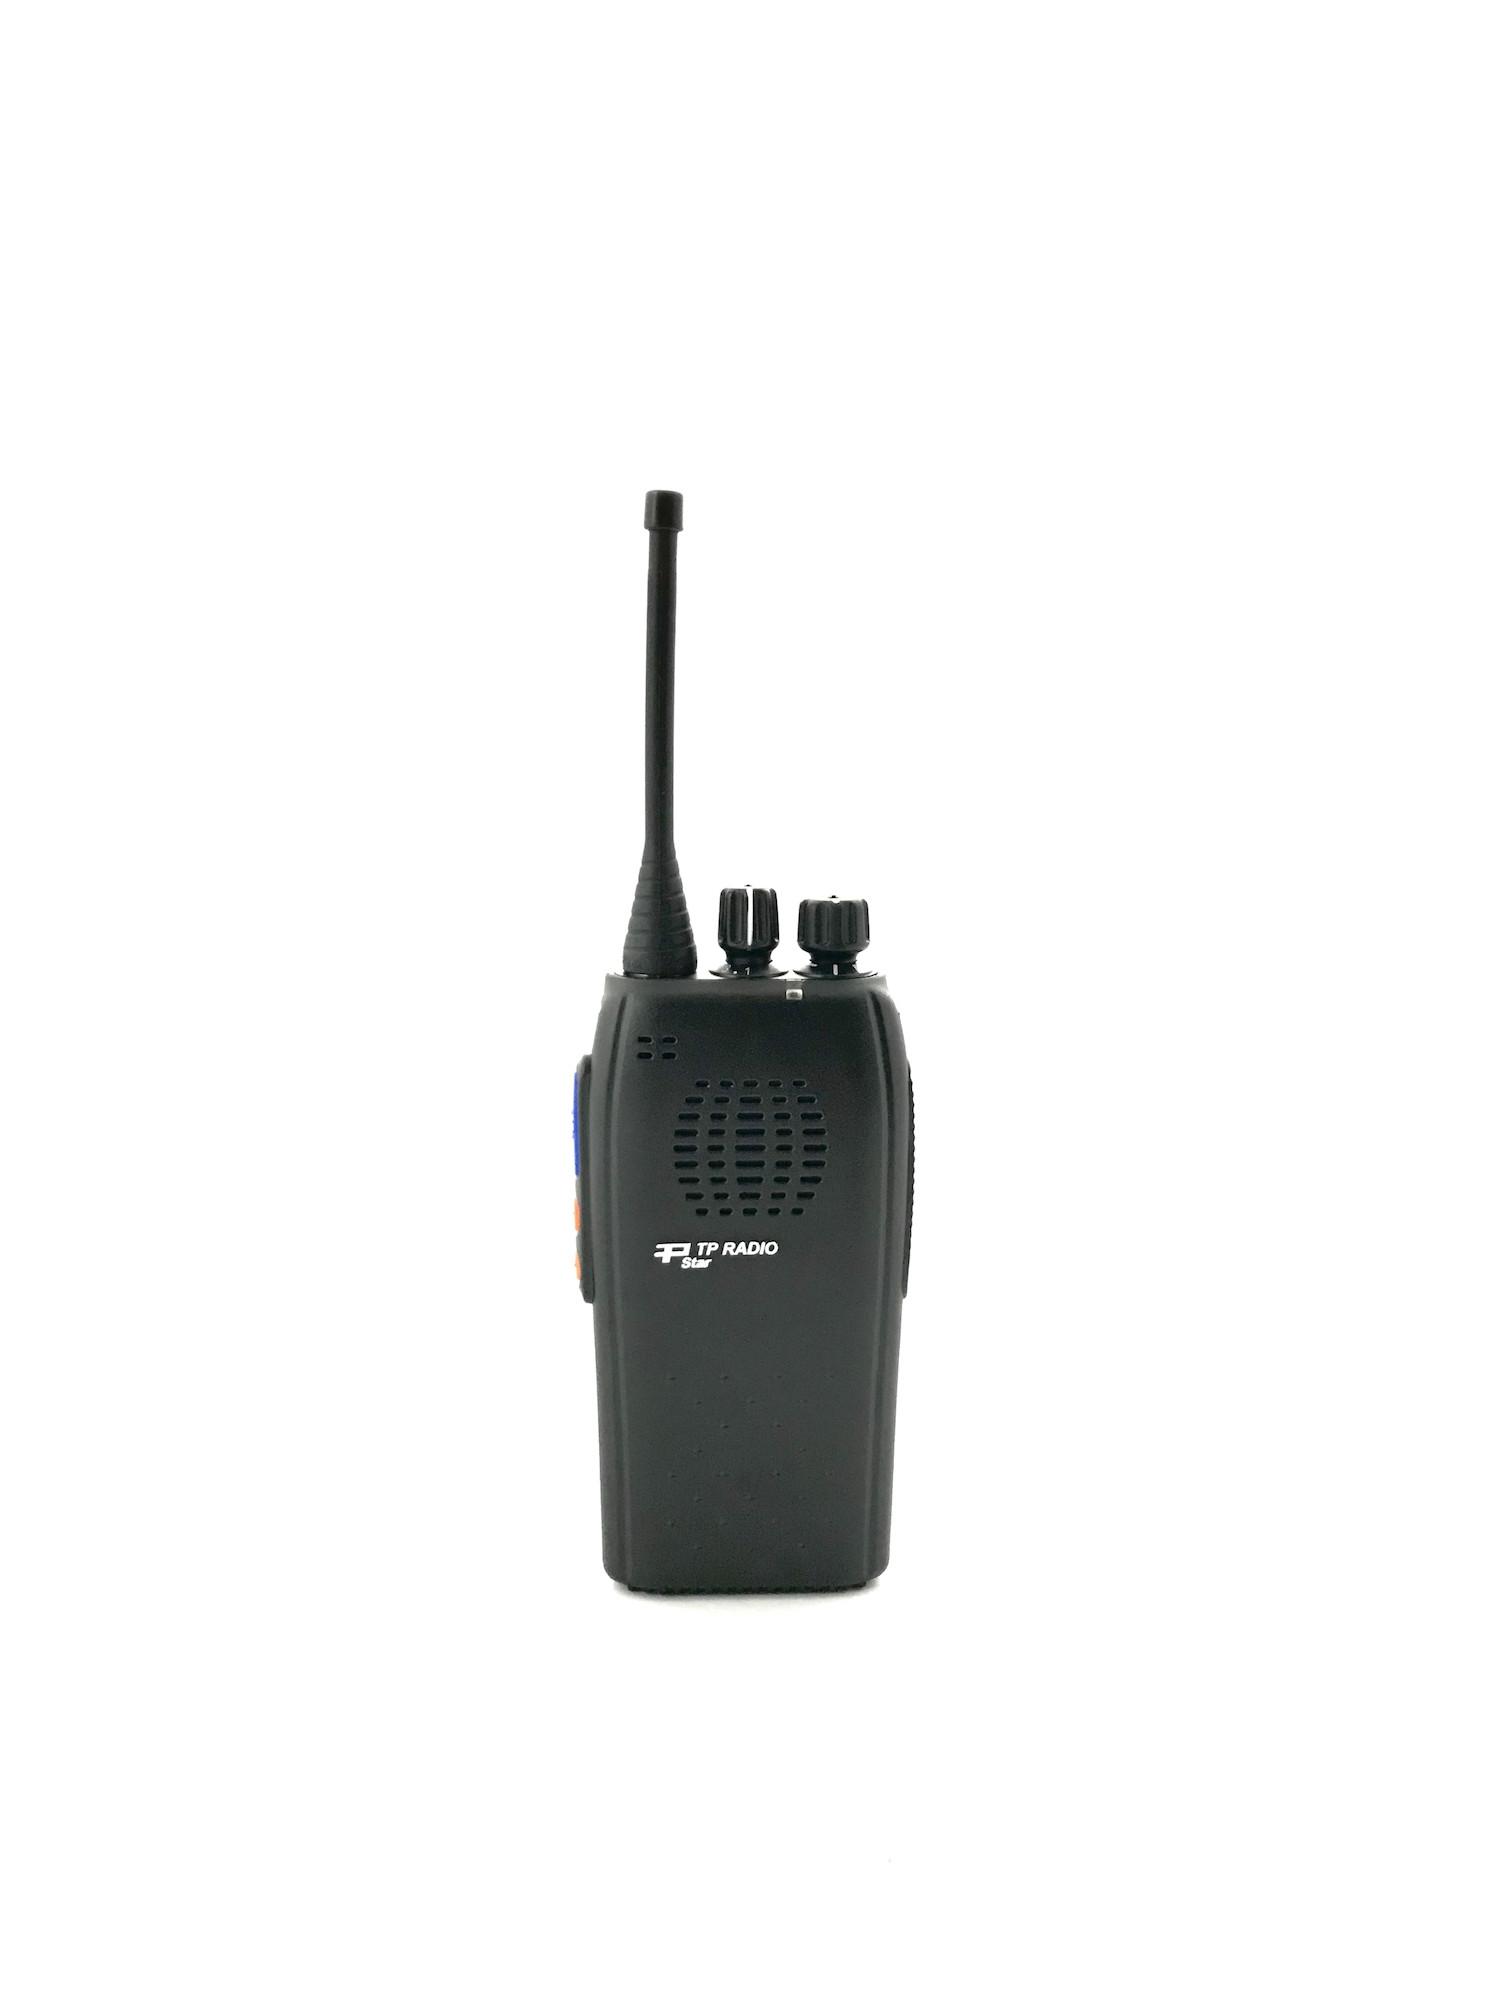 professional handheld portable radio UHF